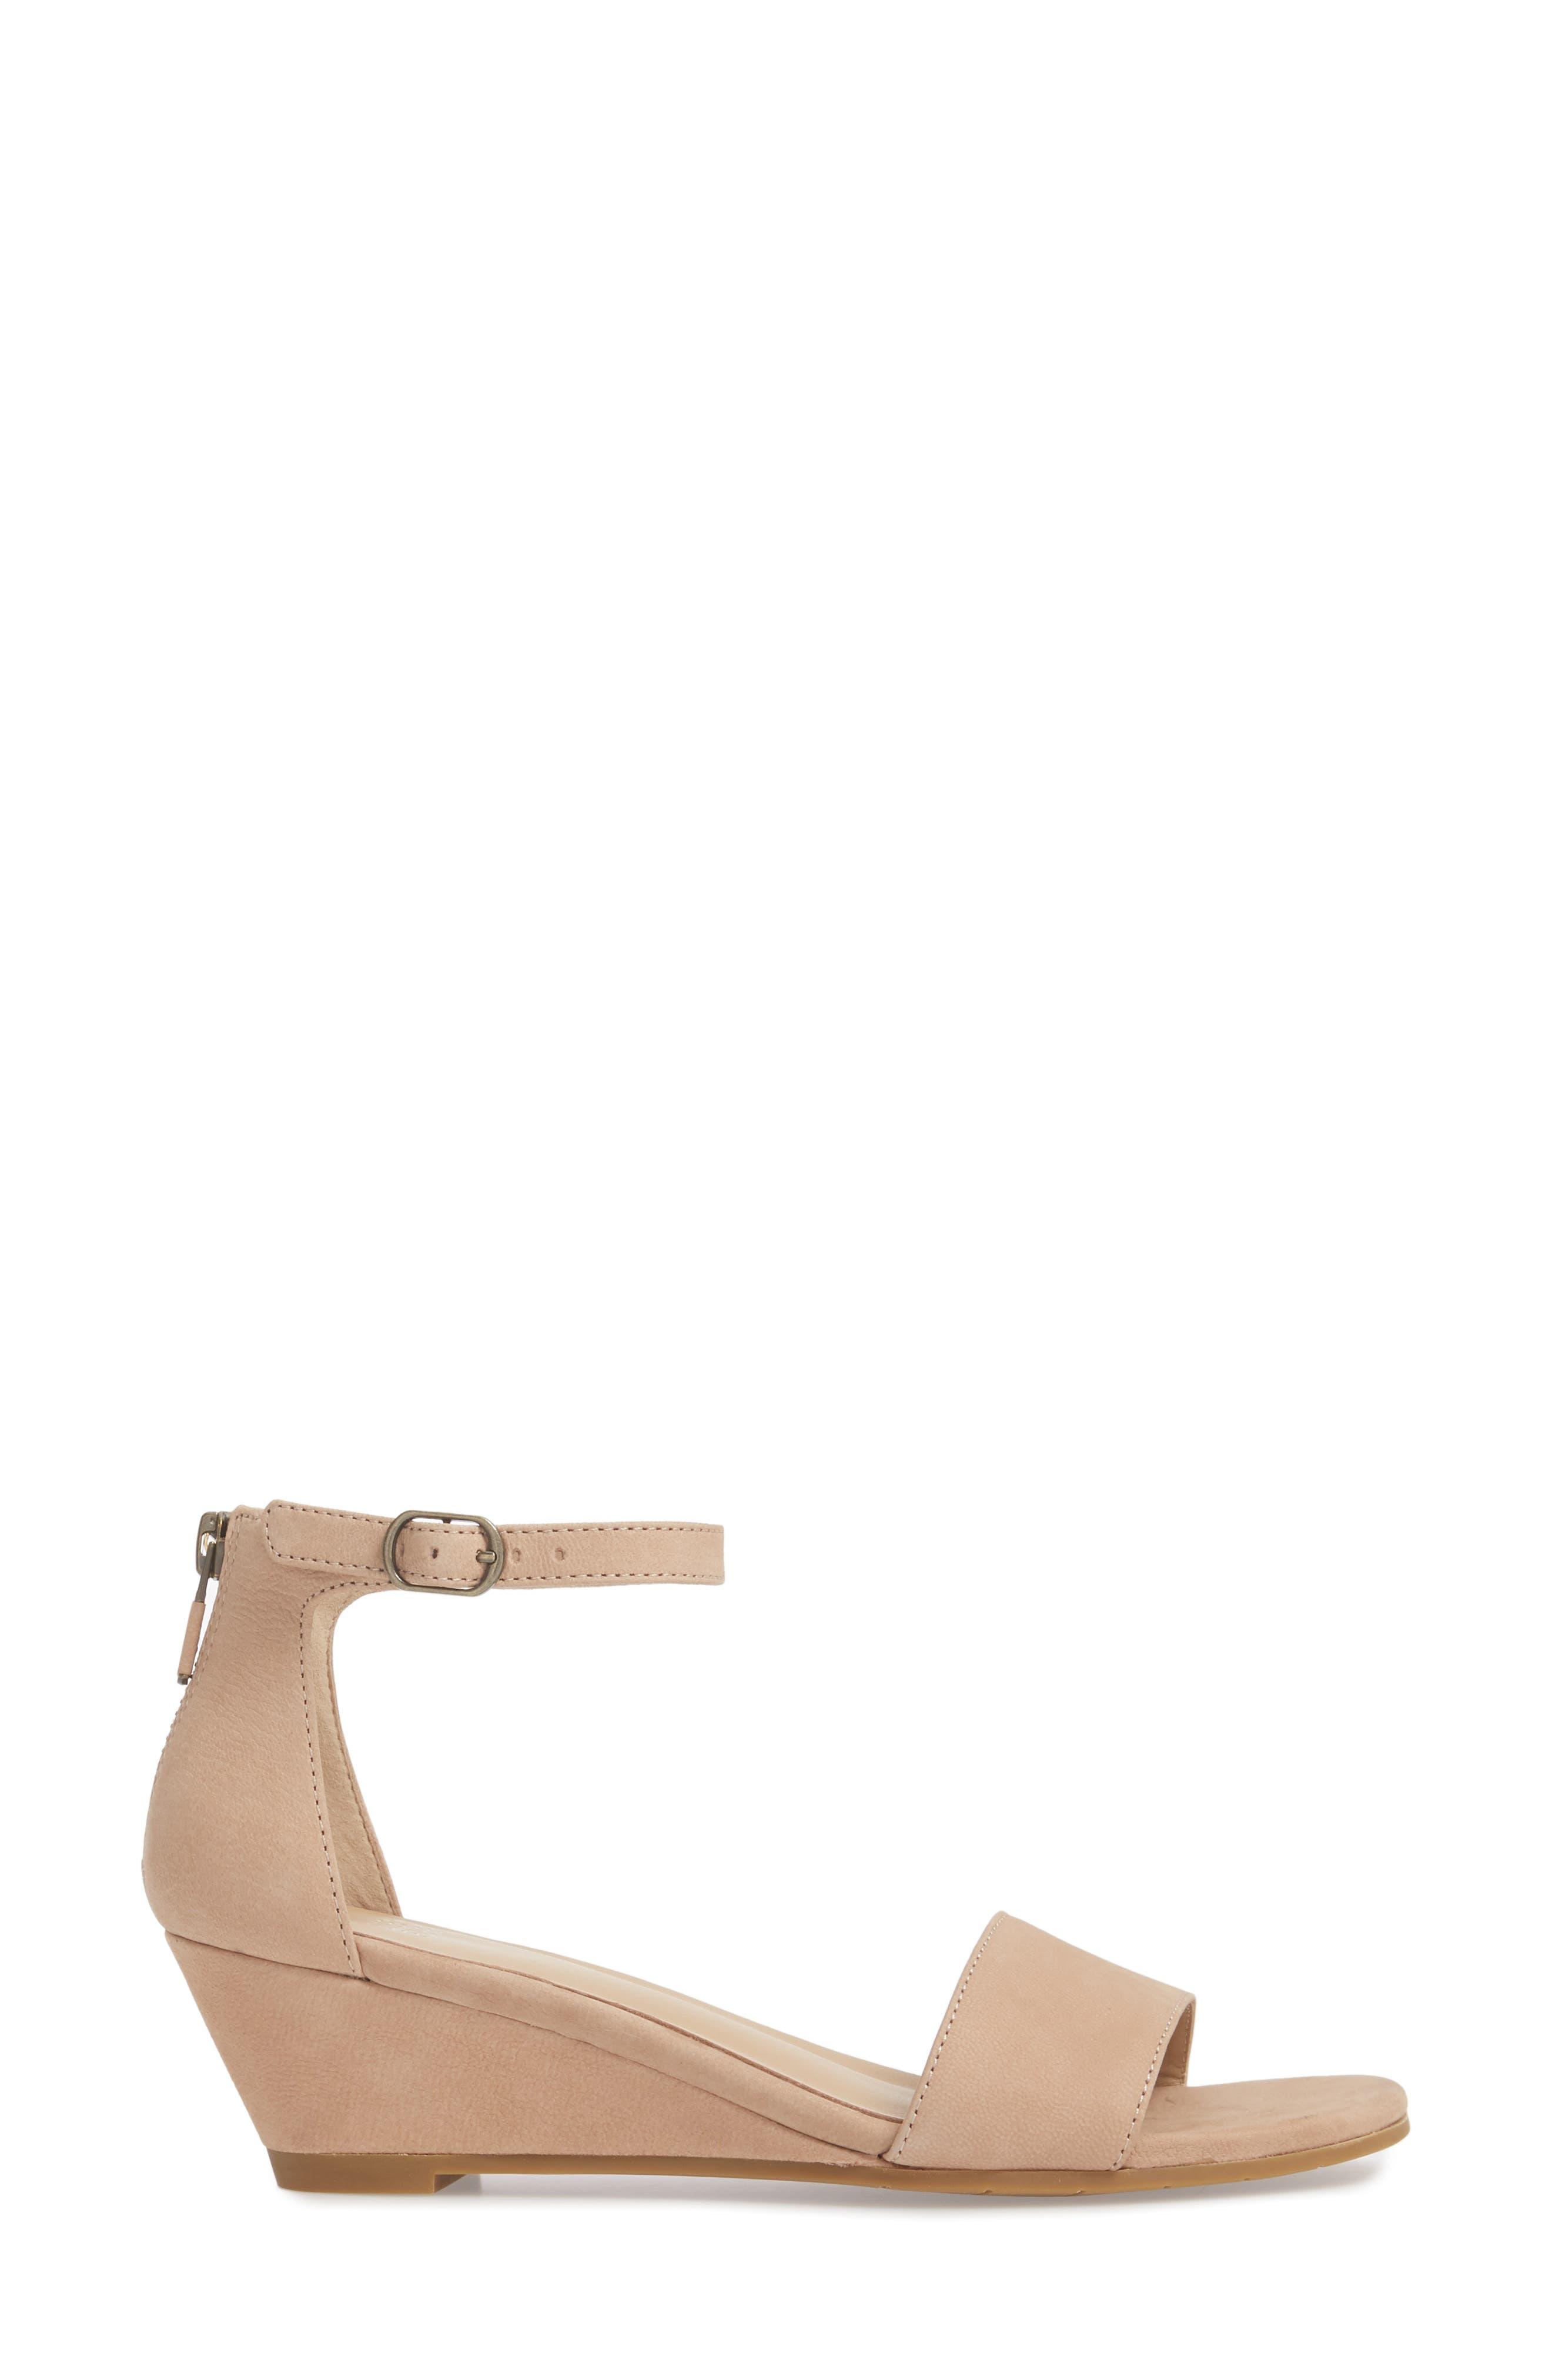 Mara Ankle Strap Wedge Sandal,                             Alternate thumbnail 11, color,